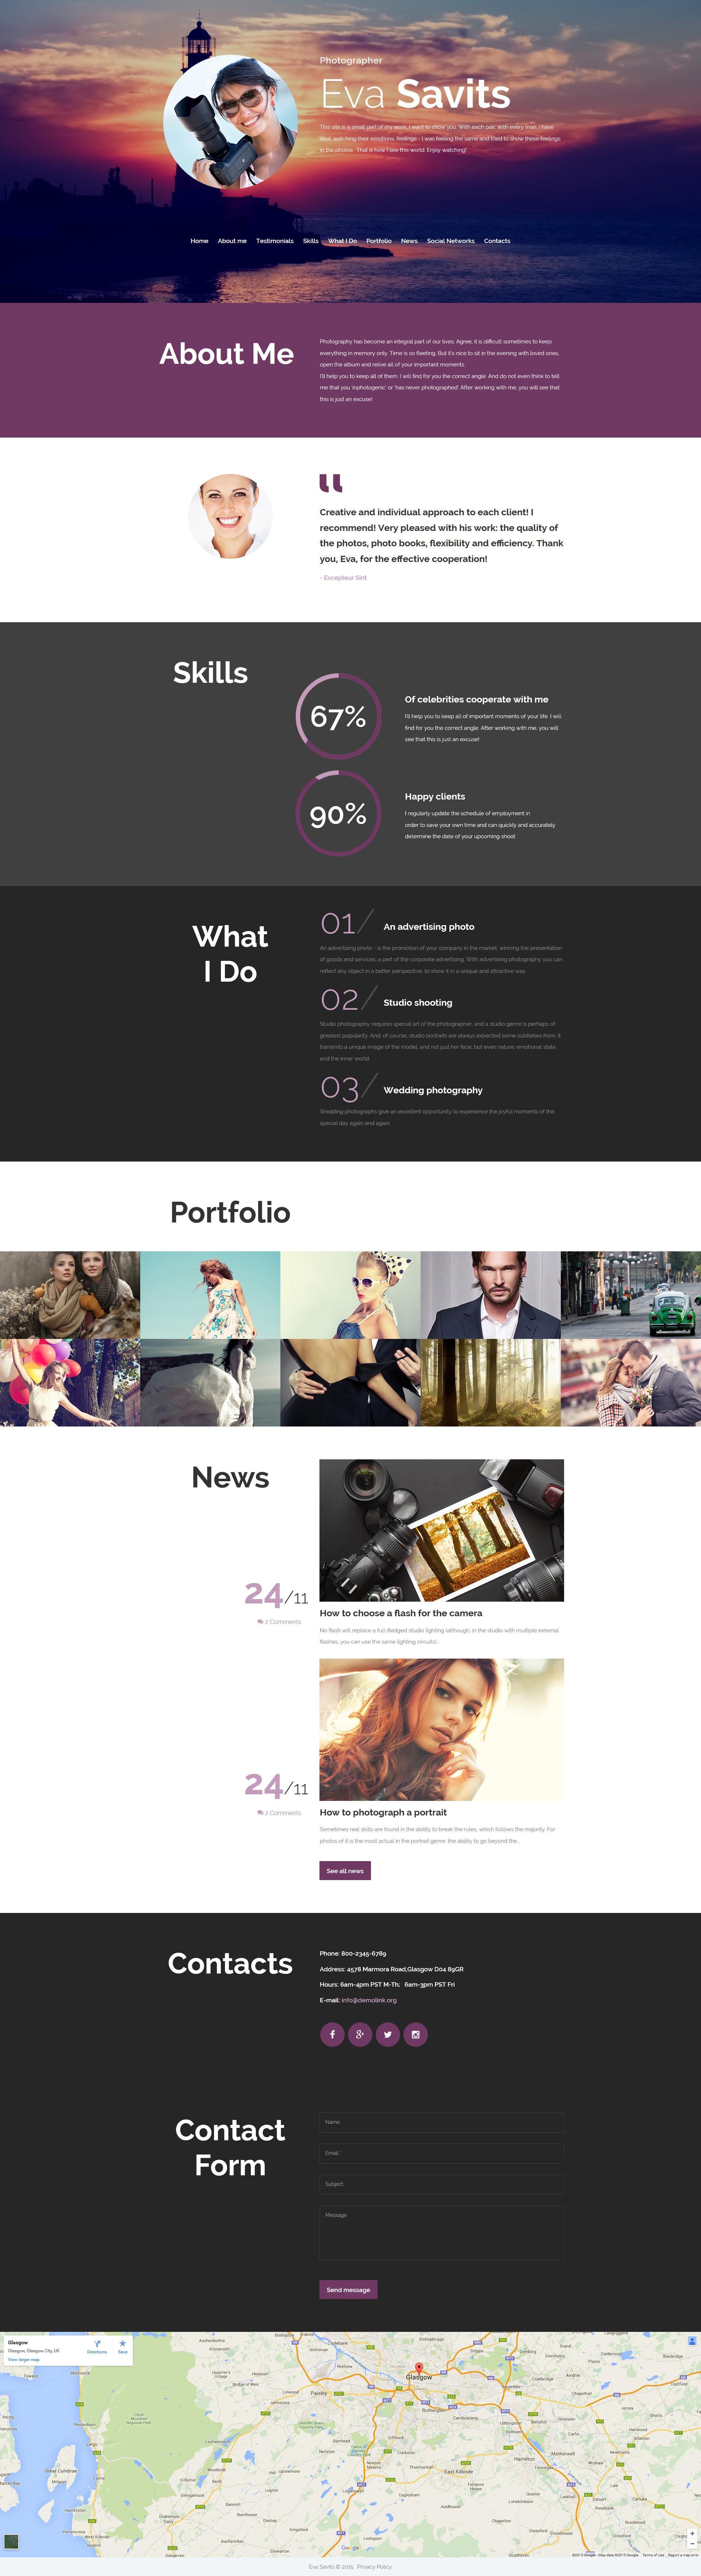 Photo Gallery Templates